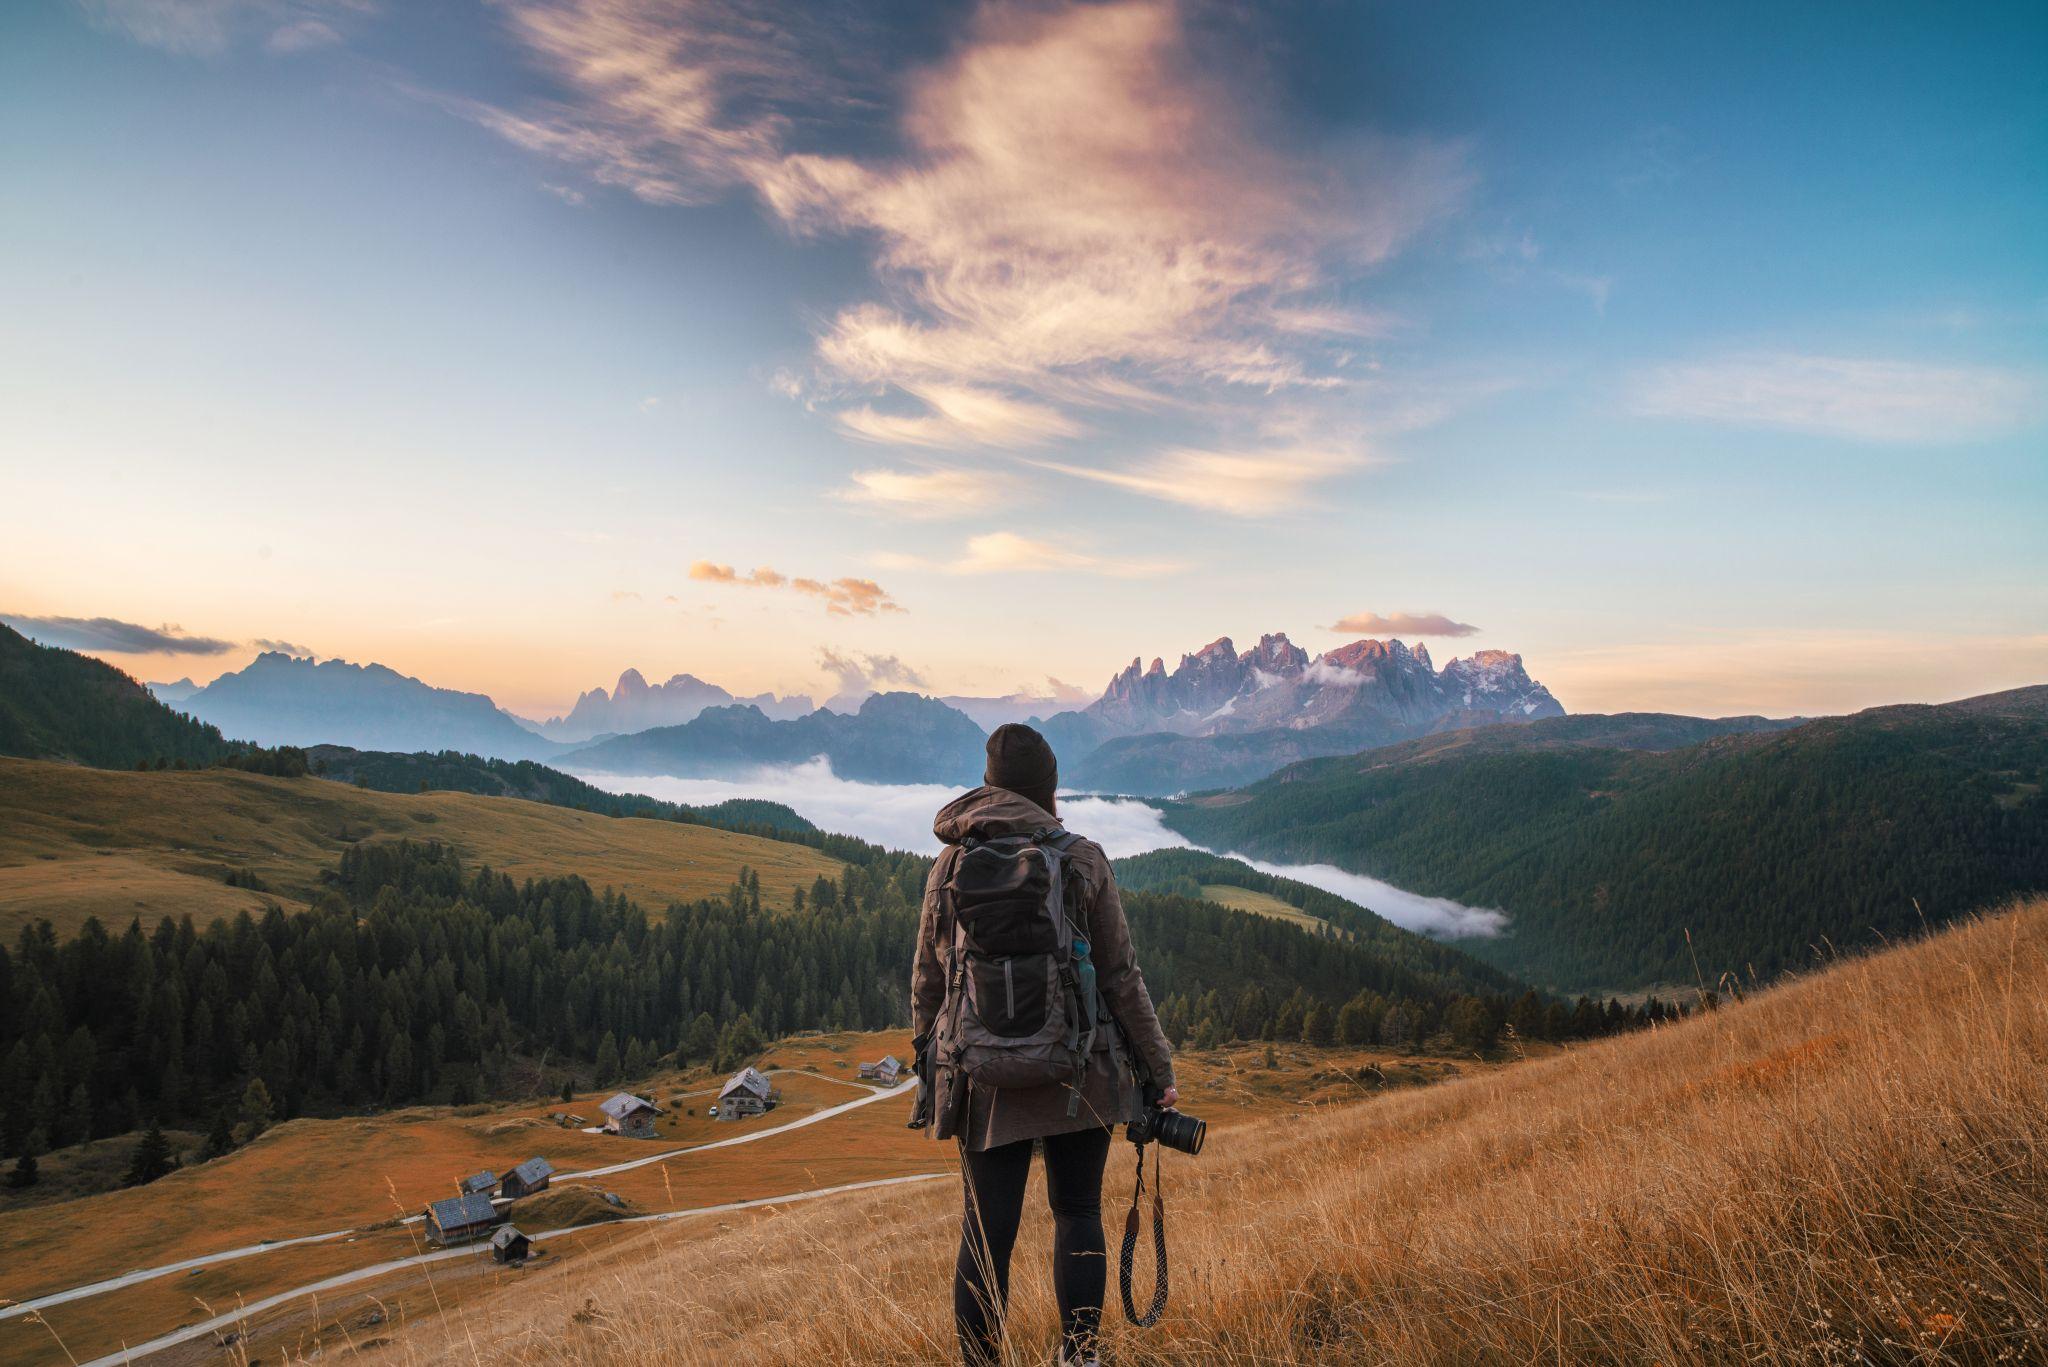 Sunrise at Passo san Pellegrino, Dolomites, Italy